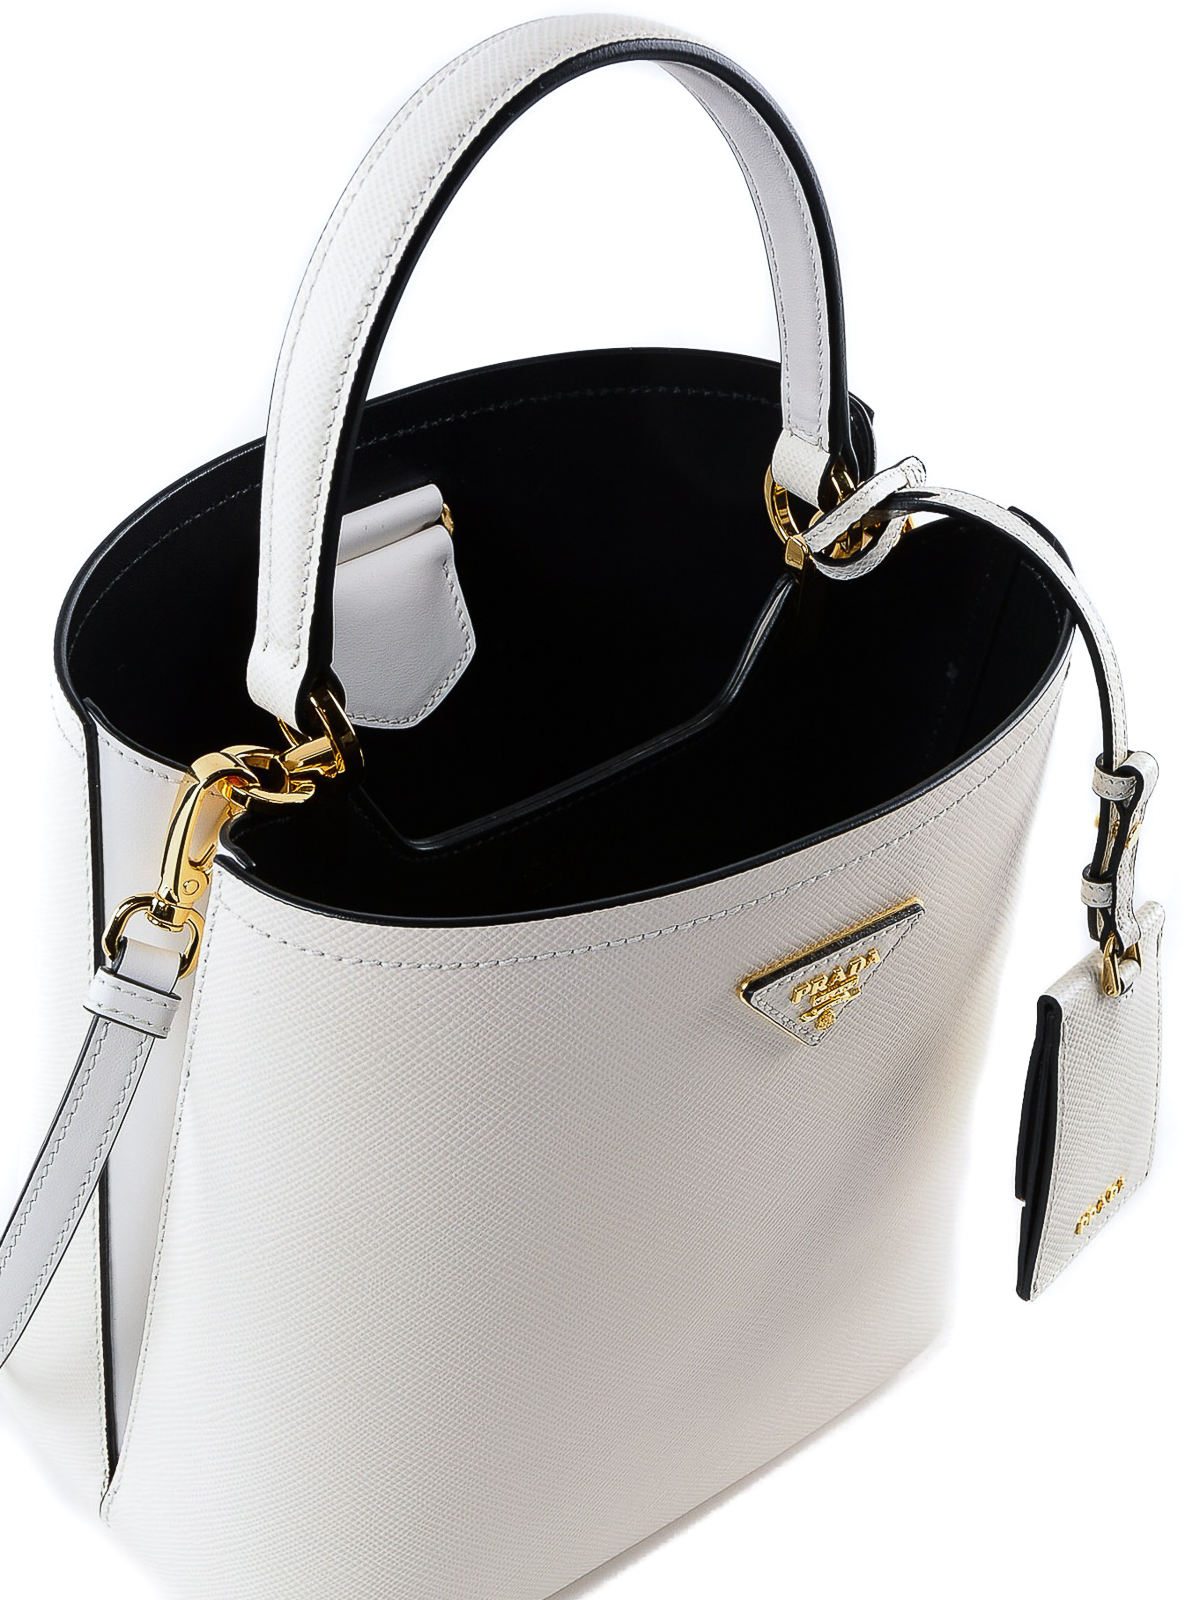 64c7674923d9 Prada - White Saffiano leather double bucket bag - Bucket bags ...